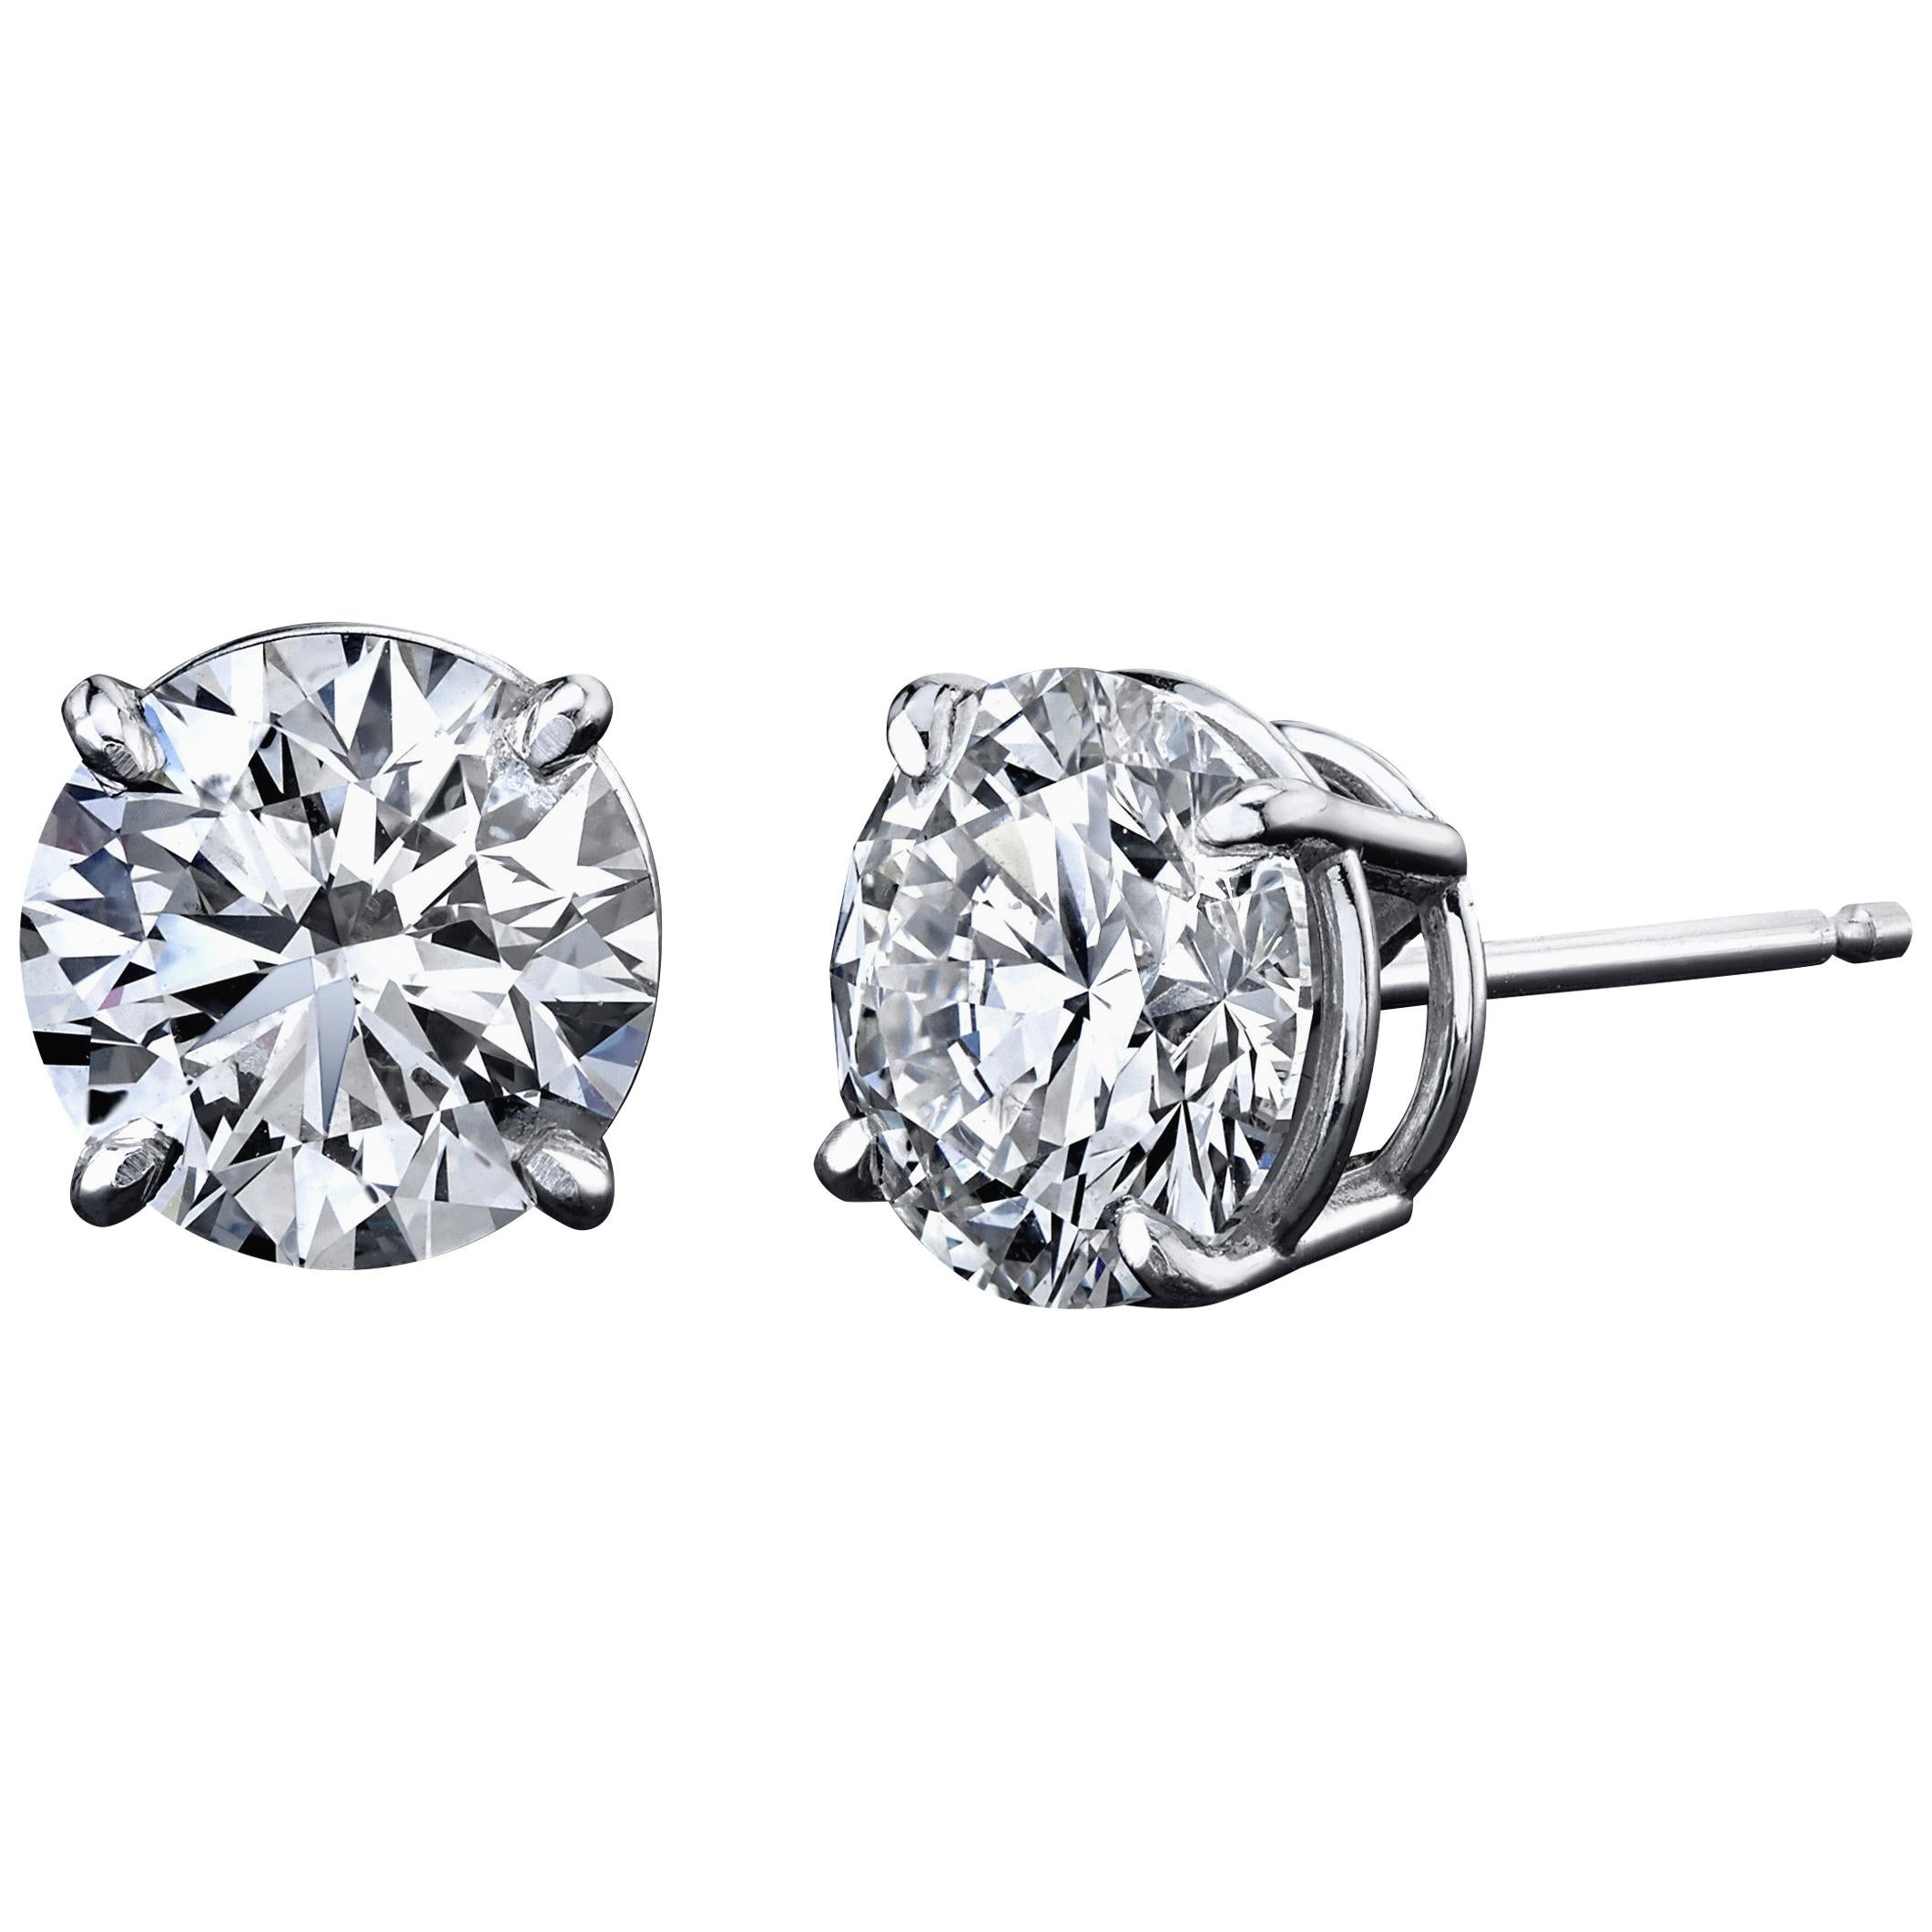 Diamond Stud Earrings 0.80 Carat with GIA Certificates 18 Karat Gold 4-Prong